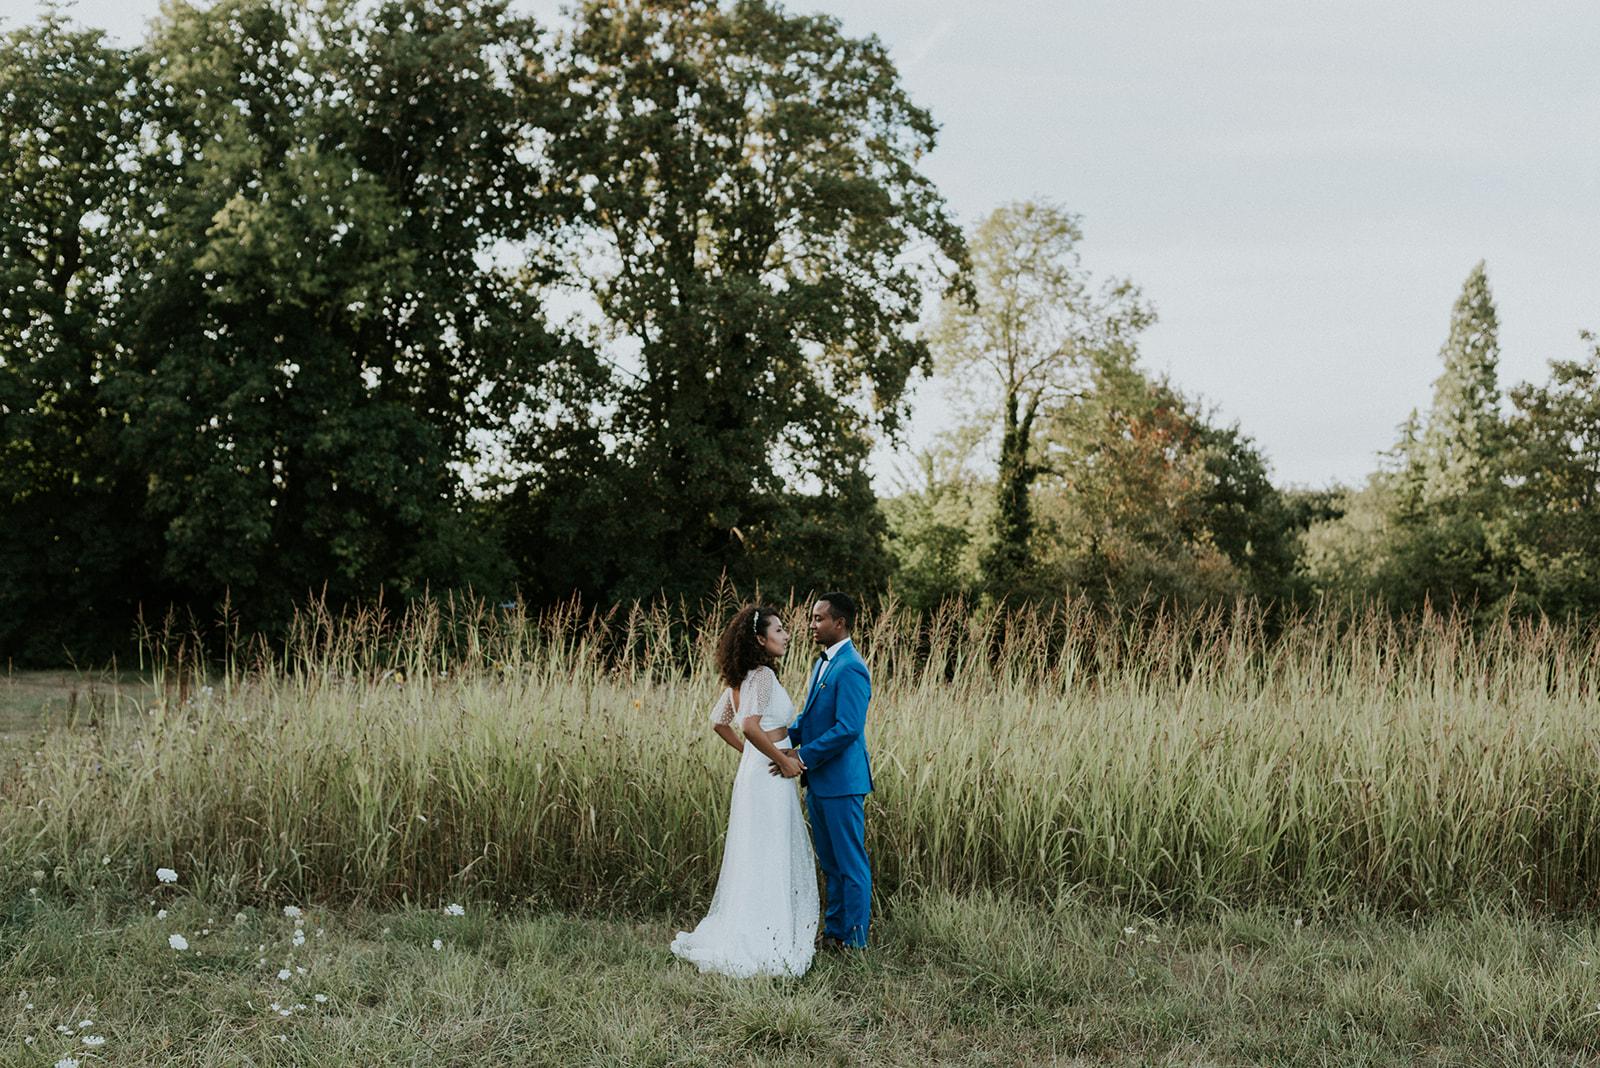 Mariage de Teddy et Arielle-603.jpg